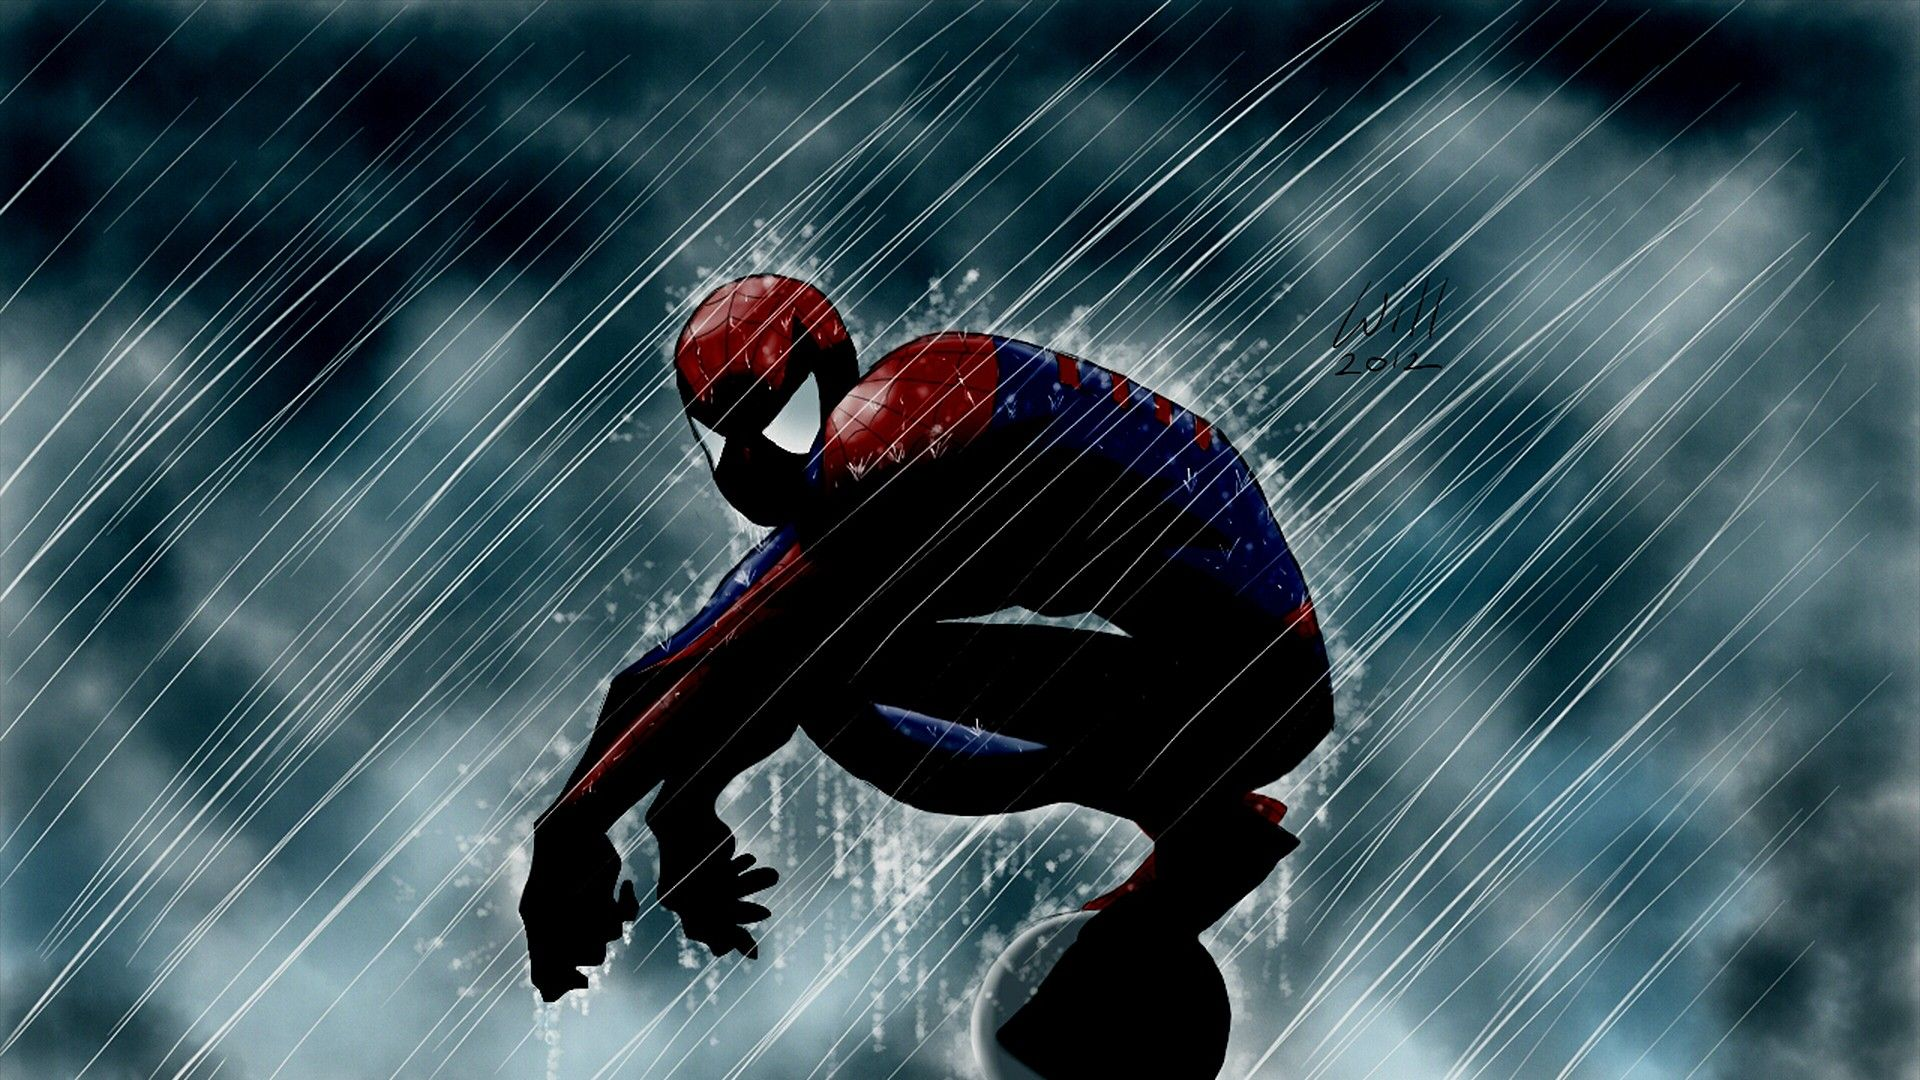 Spiderman Wallpaper HD Free Download